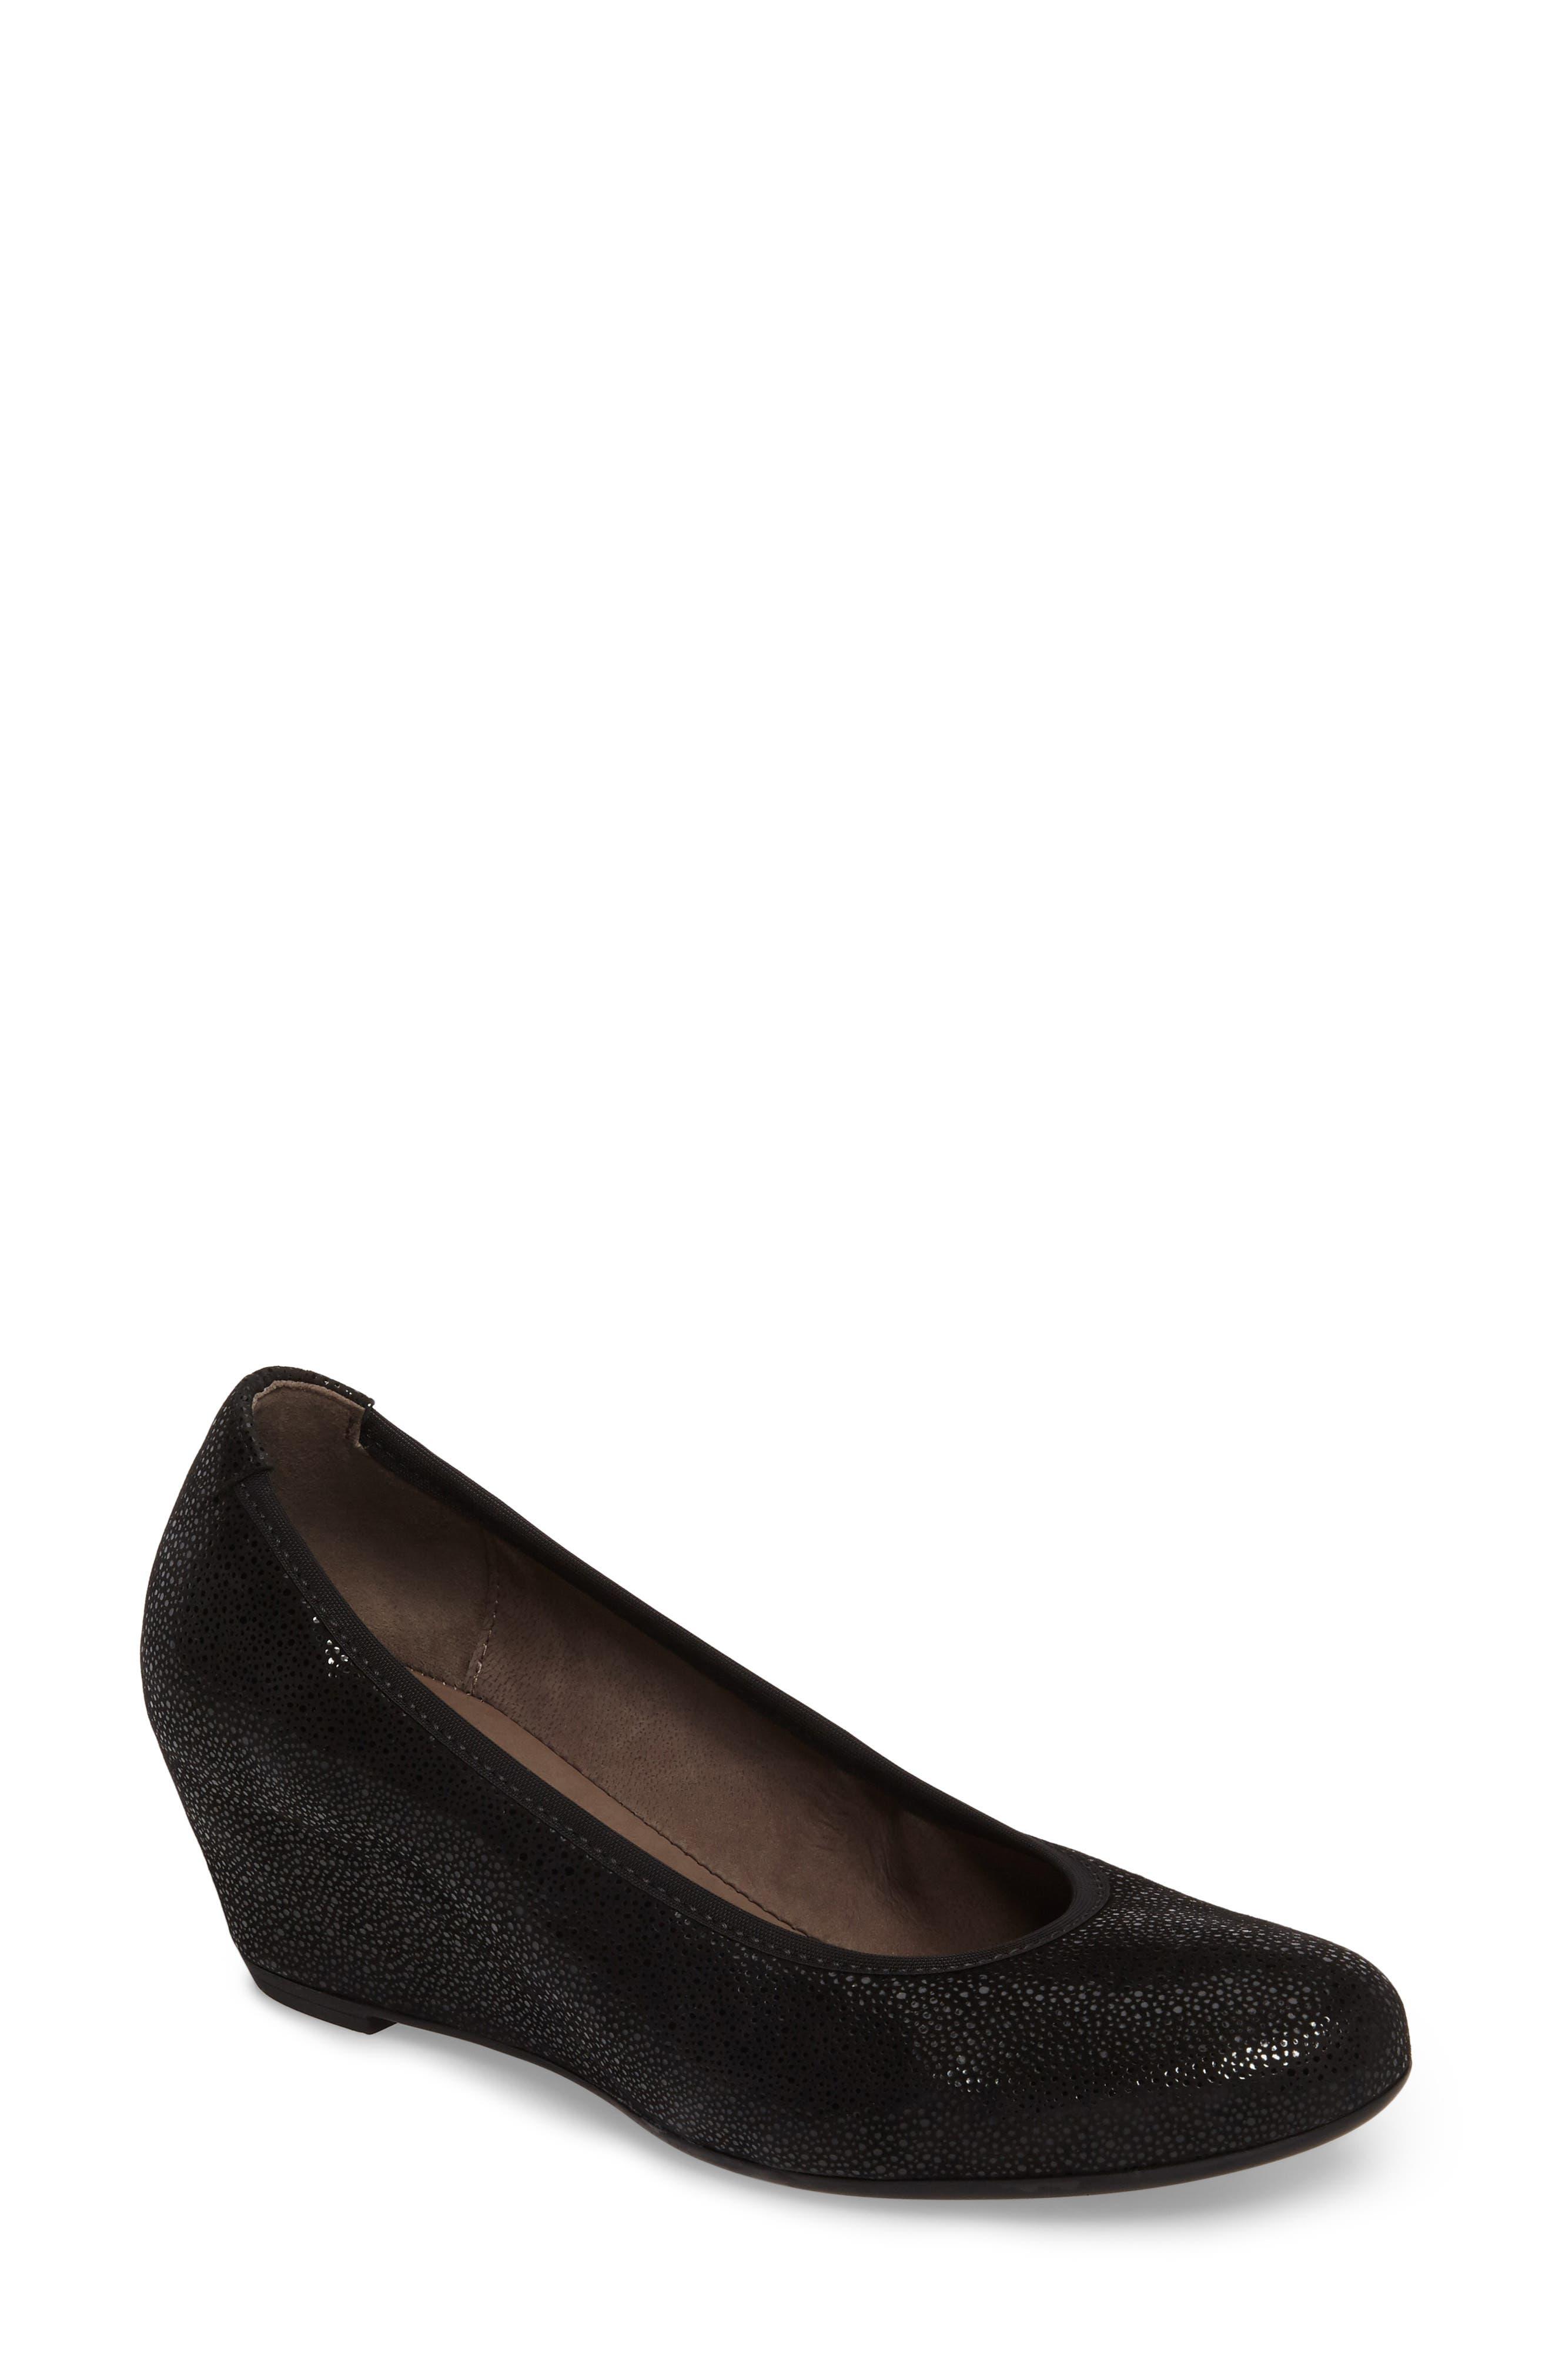 Wedge Pump,                             Main thumbnail 1, color,                             Black Glitter Leather